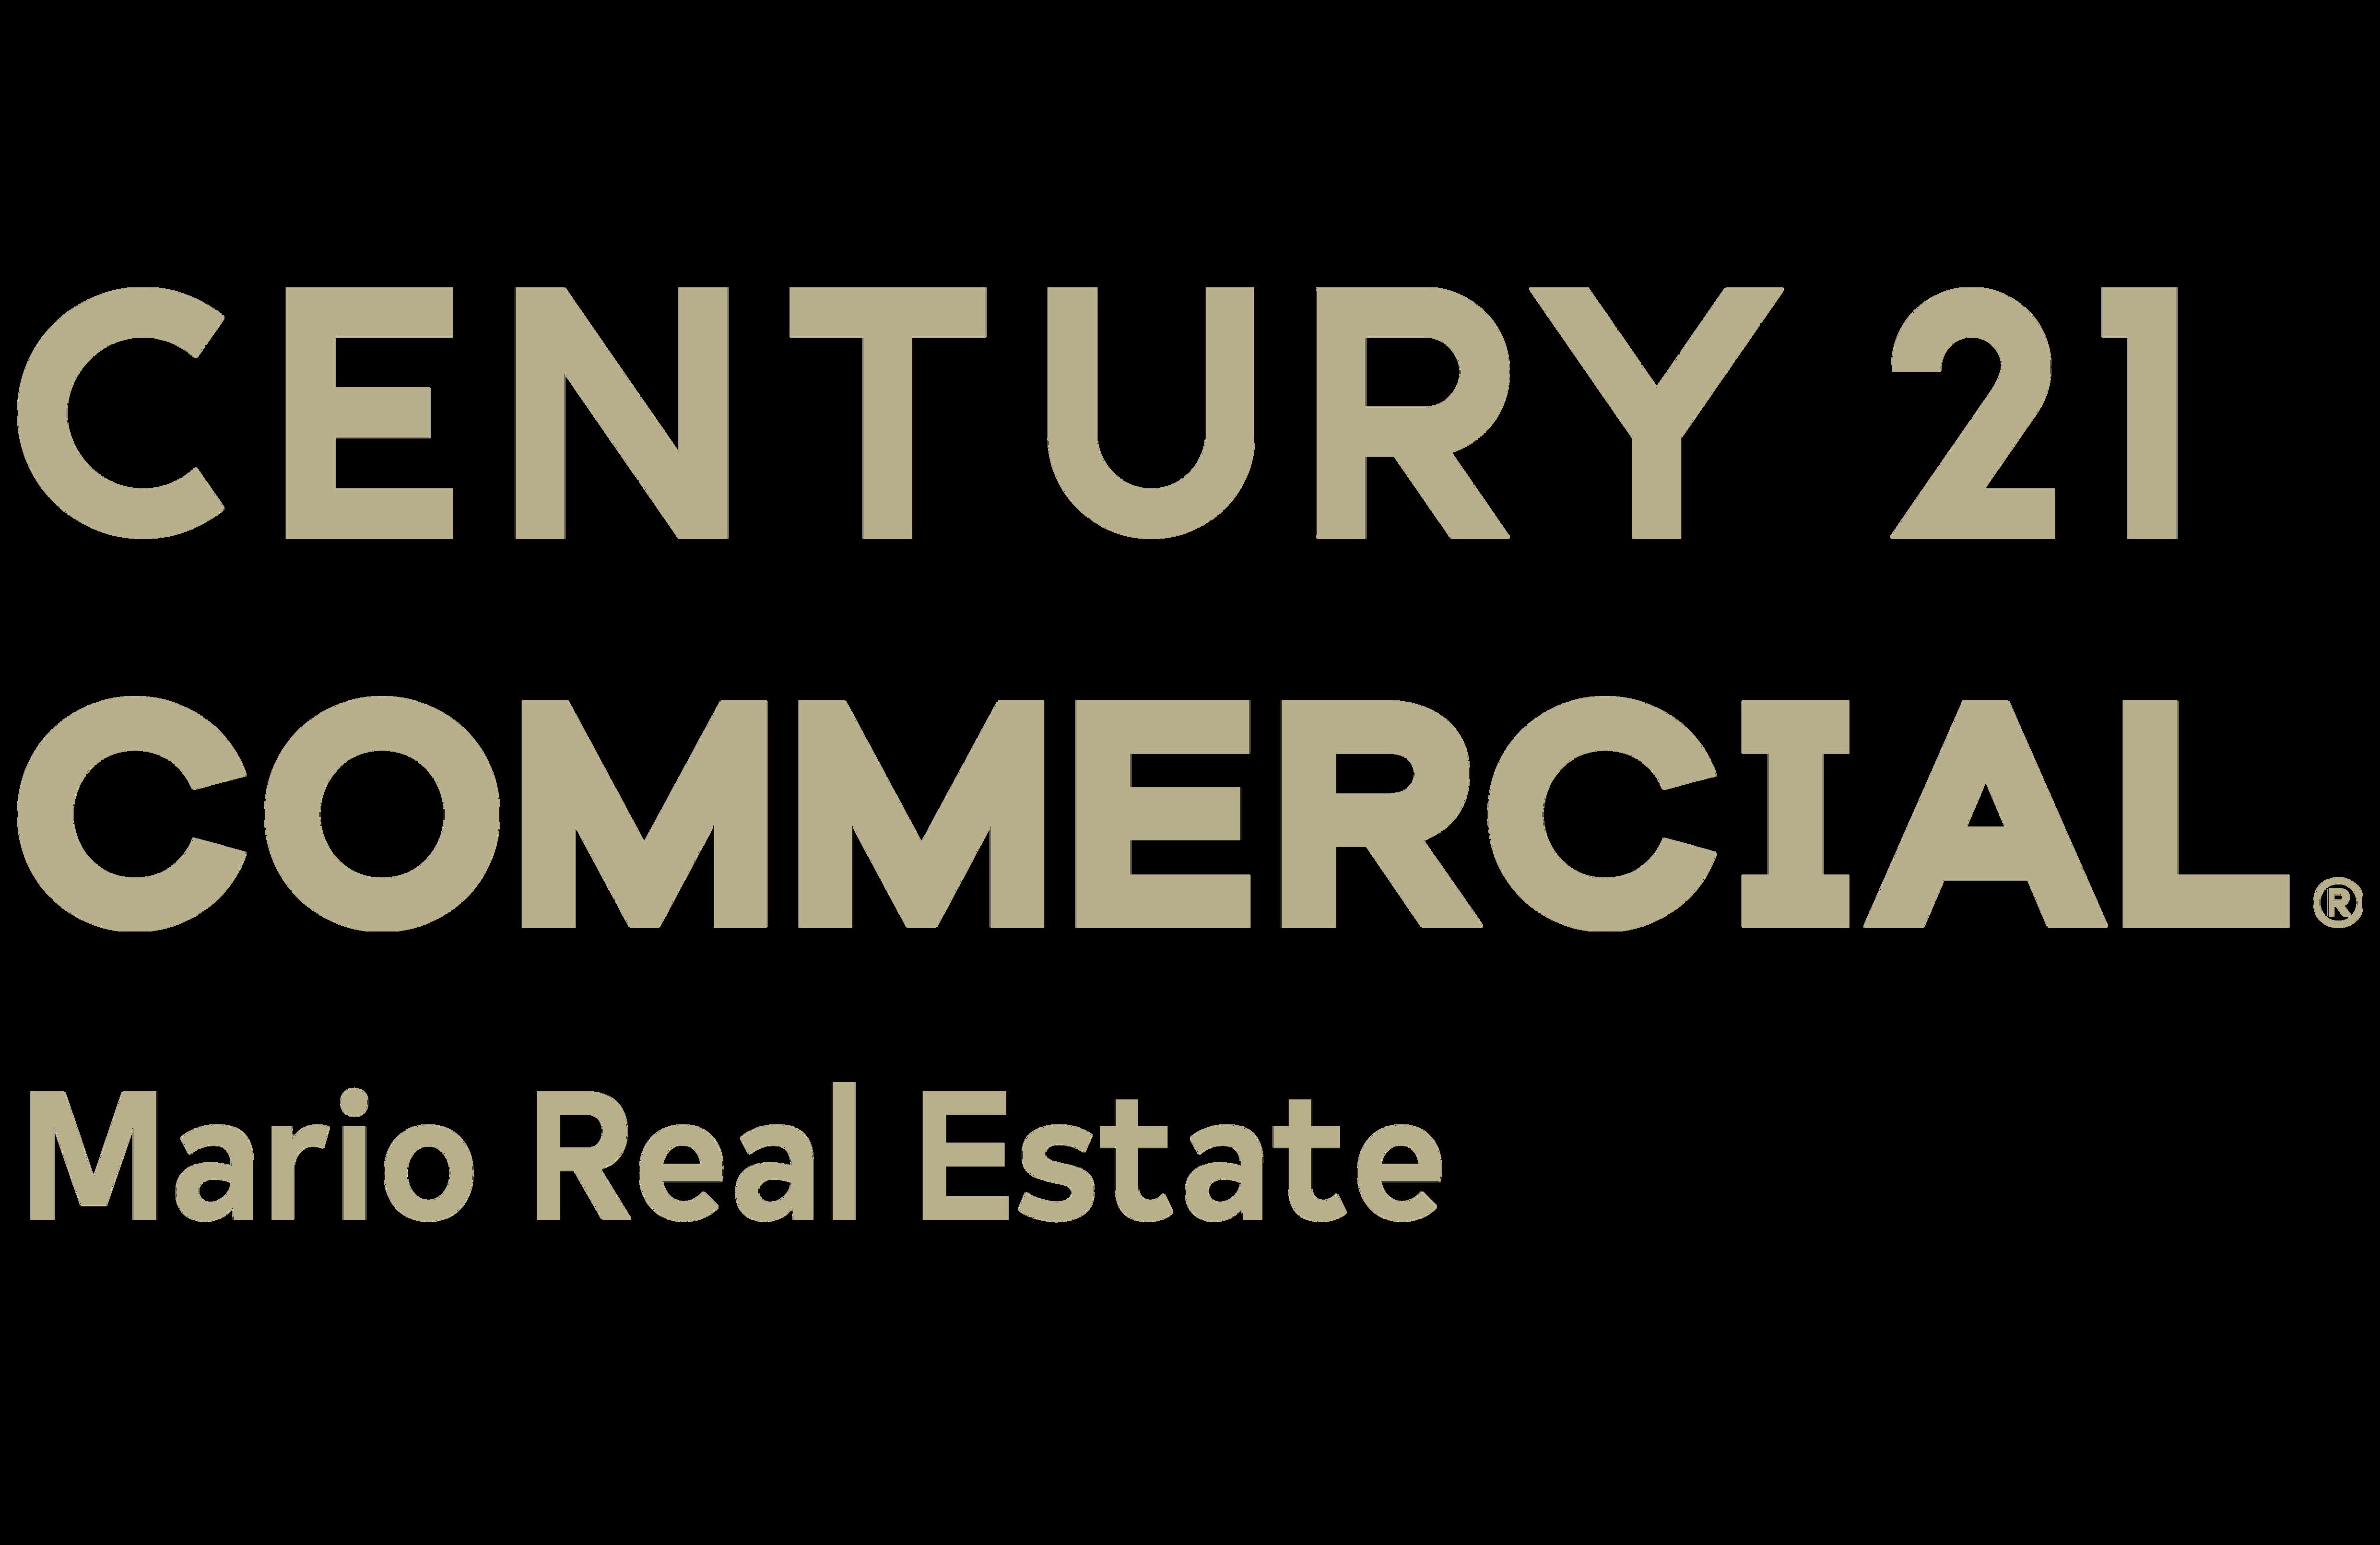 Thomas Mario of CENTURY 21 Mario Real Estate logo